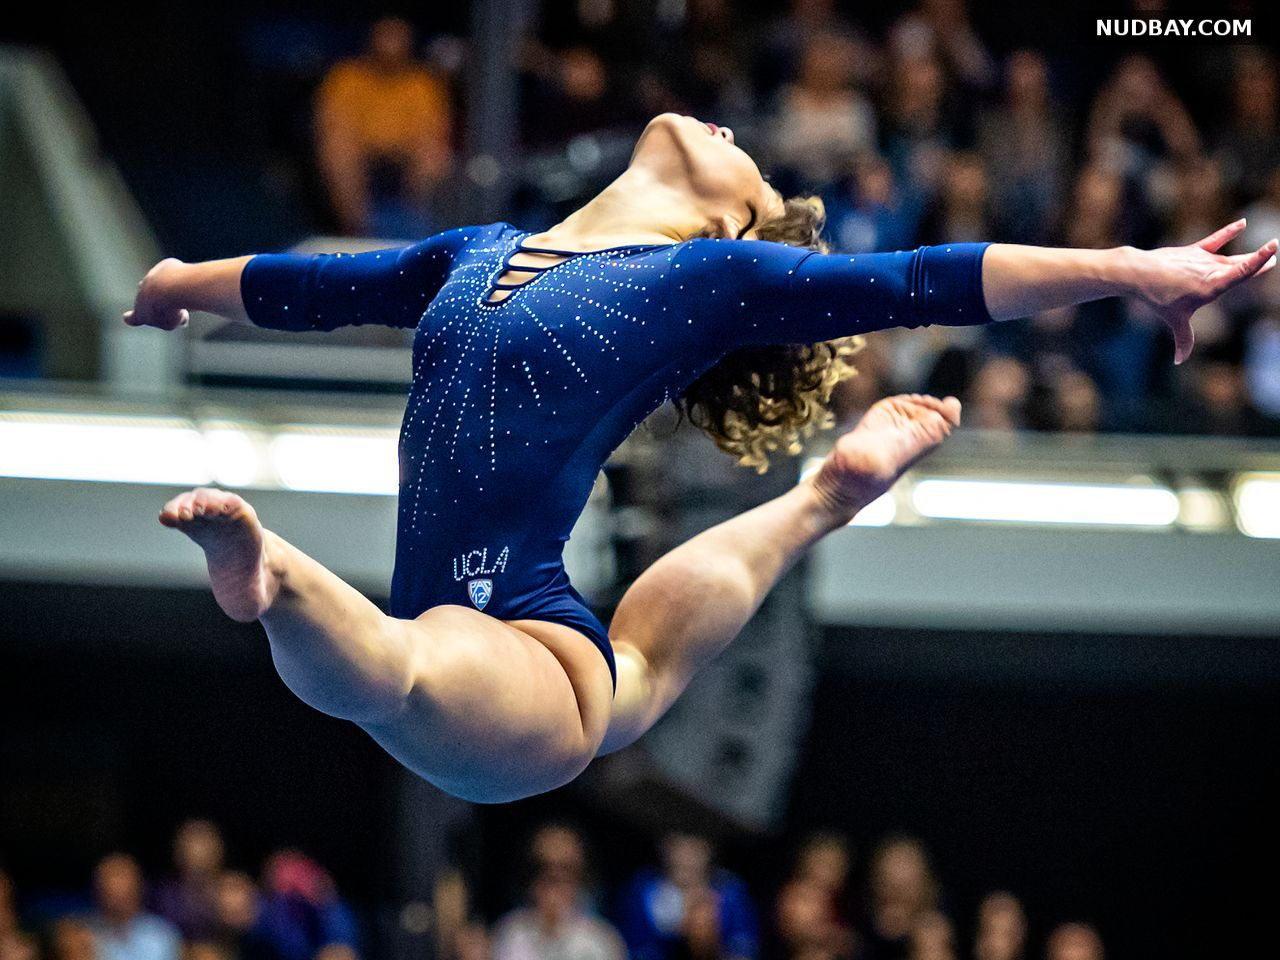 Katelyn Ohashi leggy in a blue gymnastic suit 2021